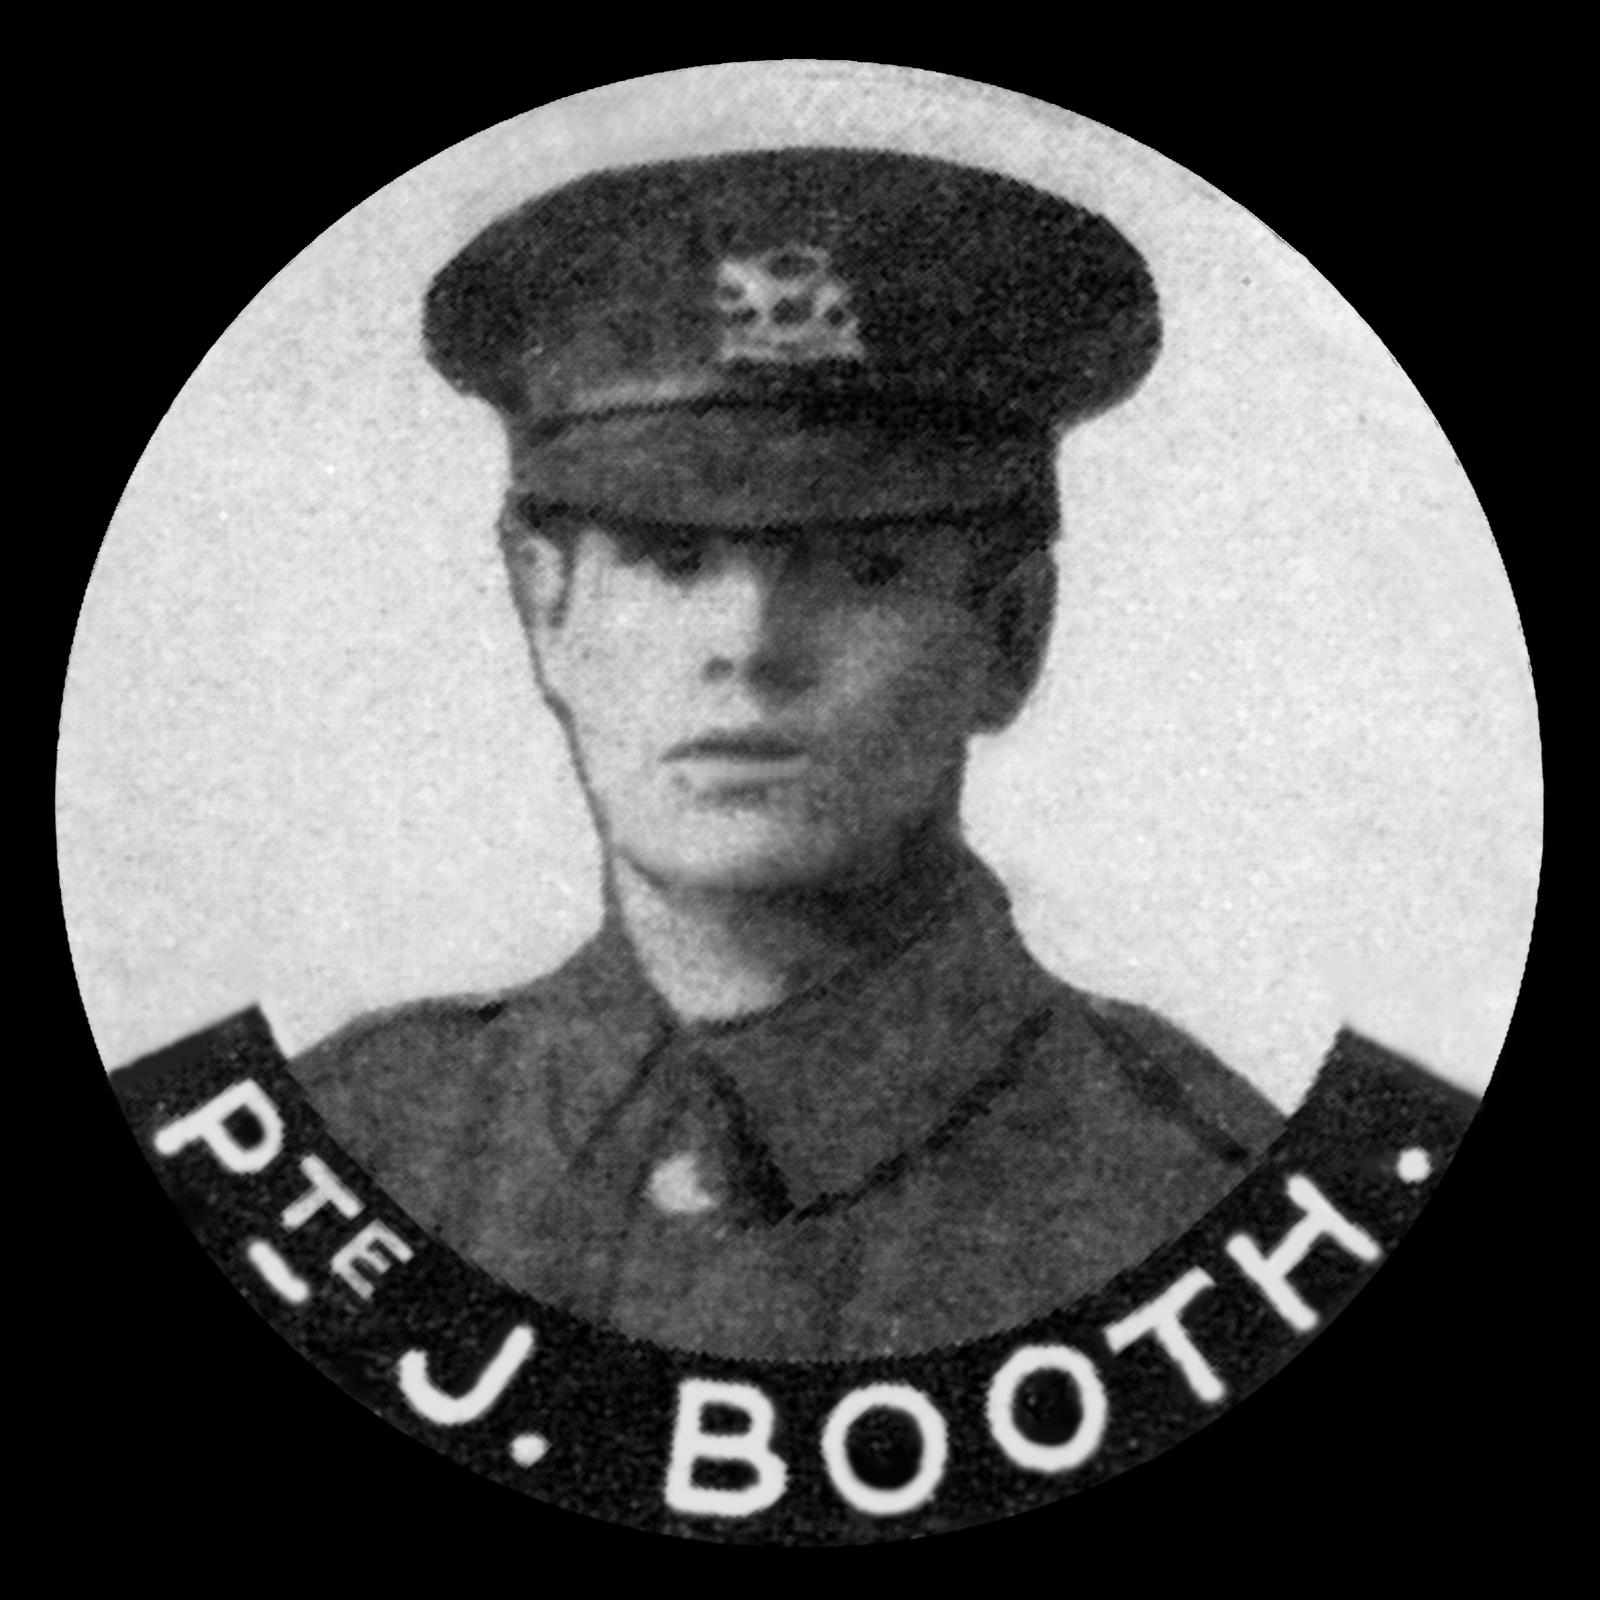 BOOTH John